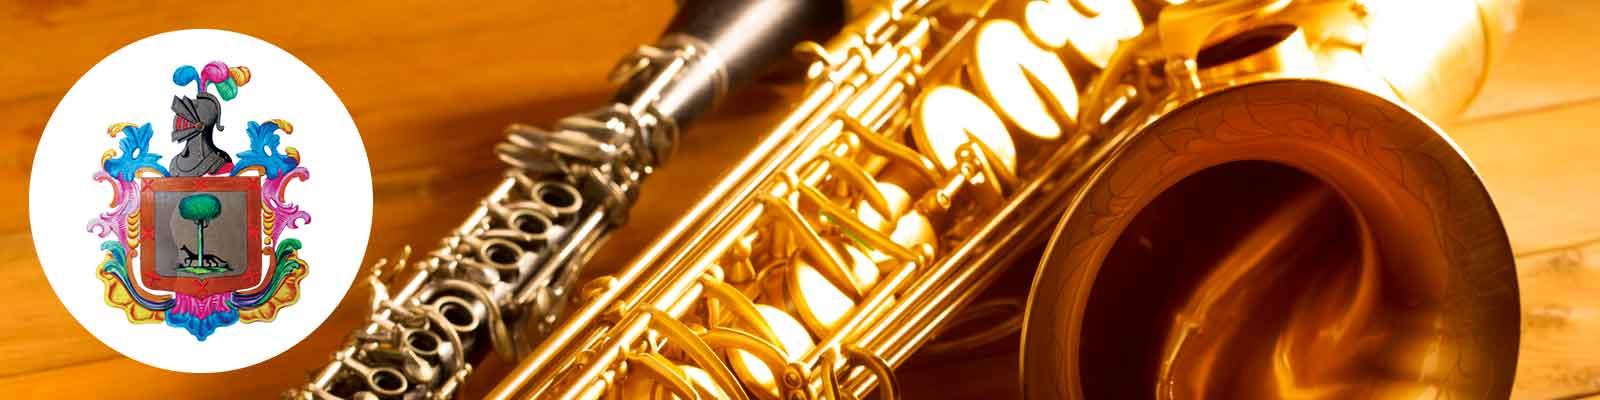 Clarinetto e Sassofono corso